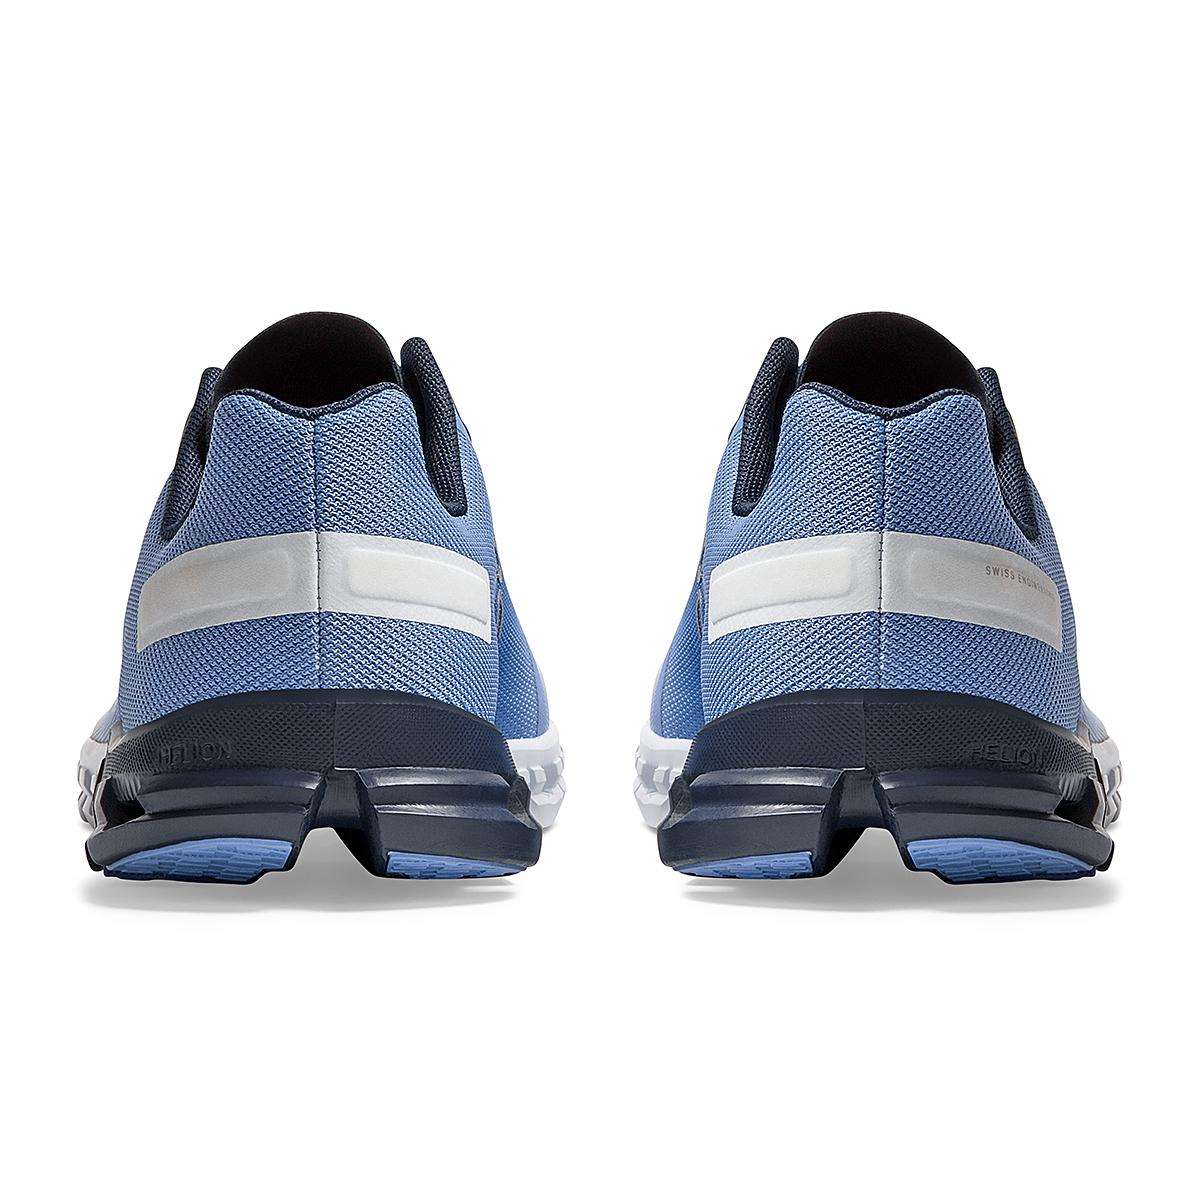 Women's On Cloudflow 3.0 Running Shoe - Color: Marina/White - Size: 5 - Width: Regular, Marina/White, large, image 5